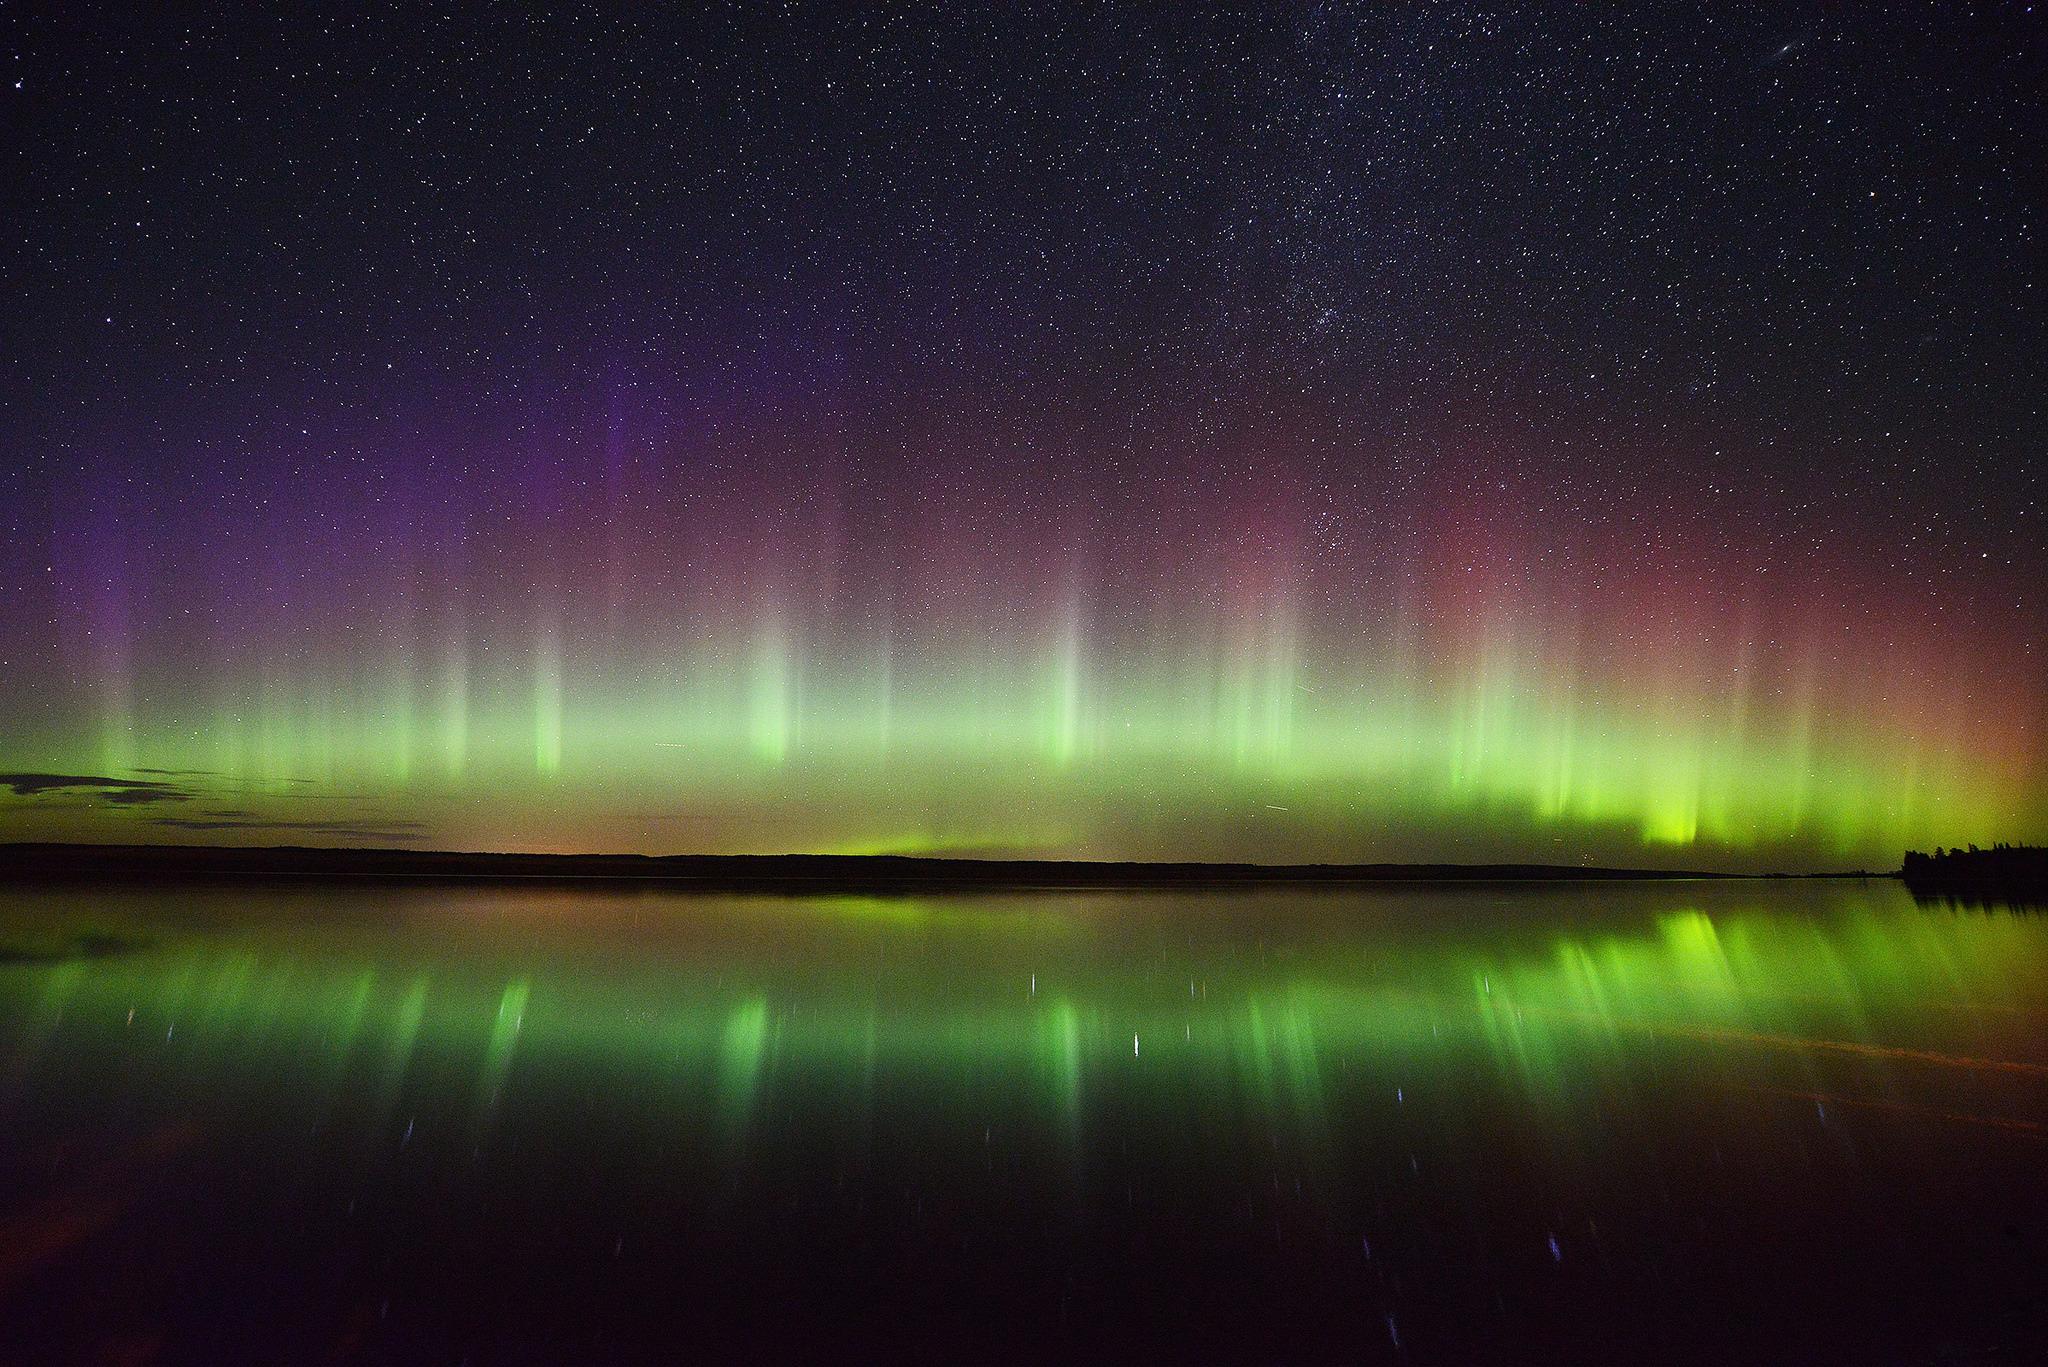 Wallpaper aurora borealis northern lights night stars wallpapers 2048x1367